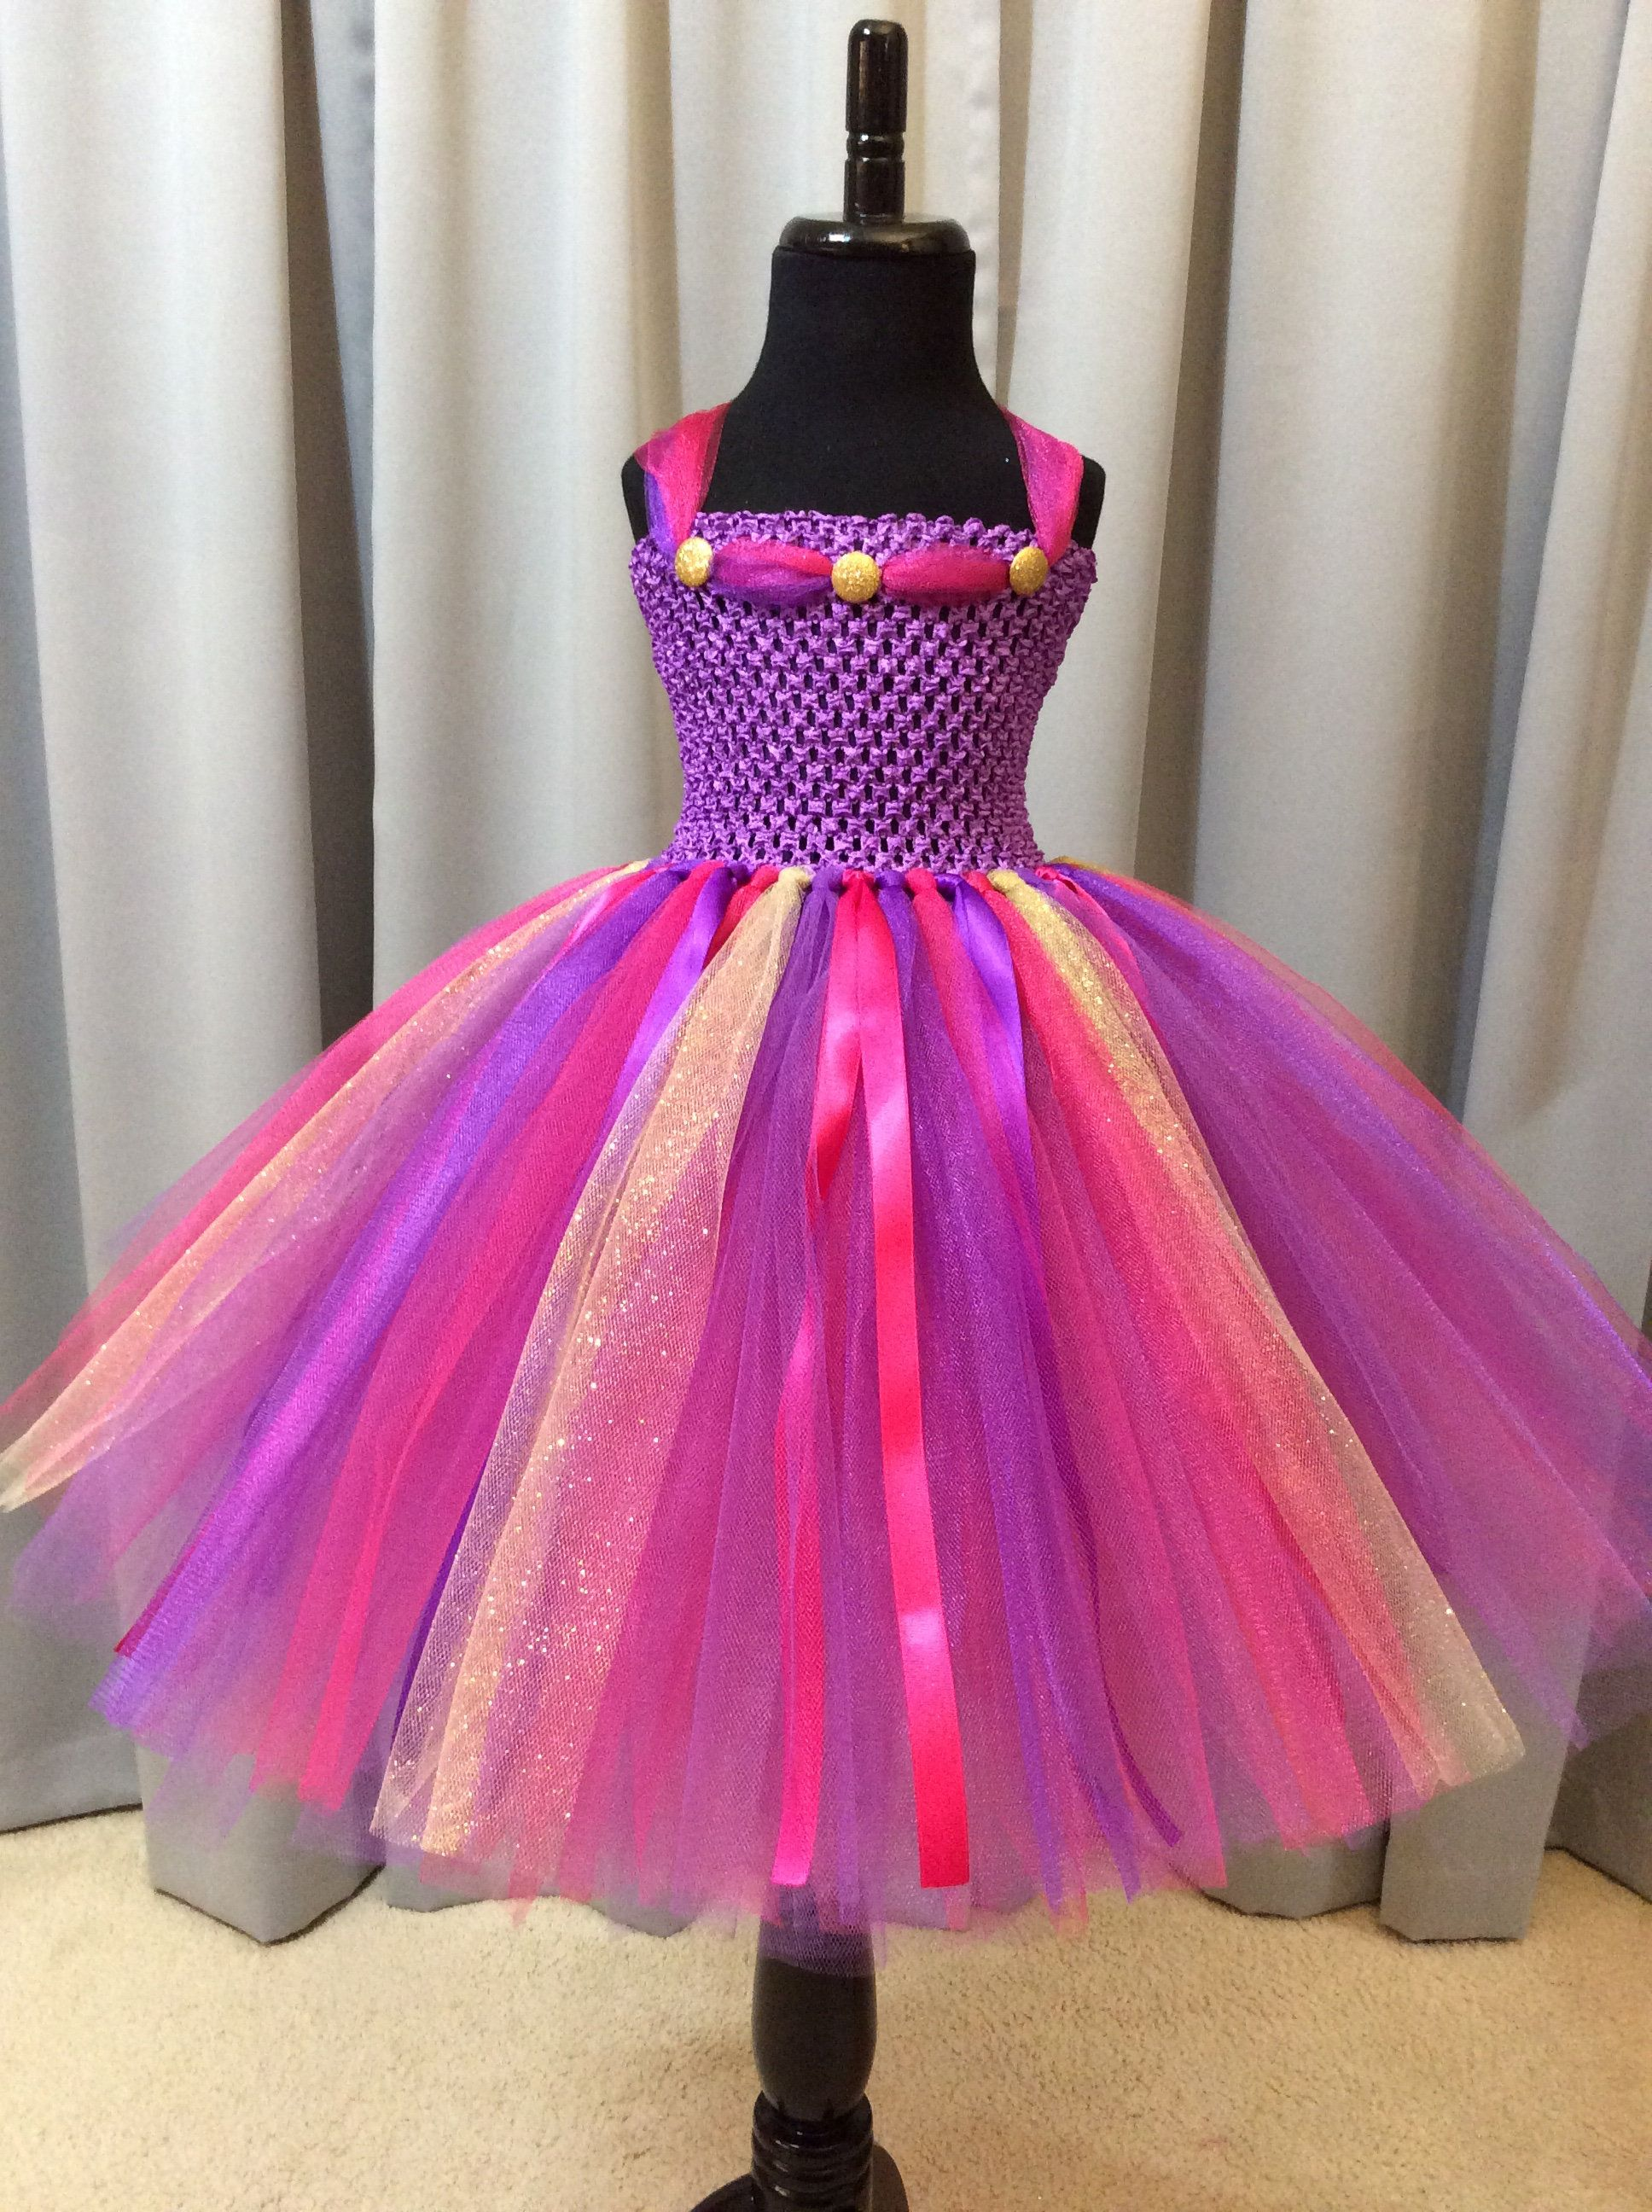 Purple Fuchsia Gold Princess Tutu Dress Tutu Dress For Etsy Princess Dress Up Princess Tutu Dresses Princess Tutu Dress [ 2592 x 1936 Pixel ]